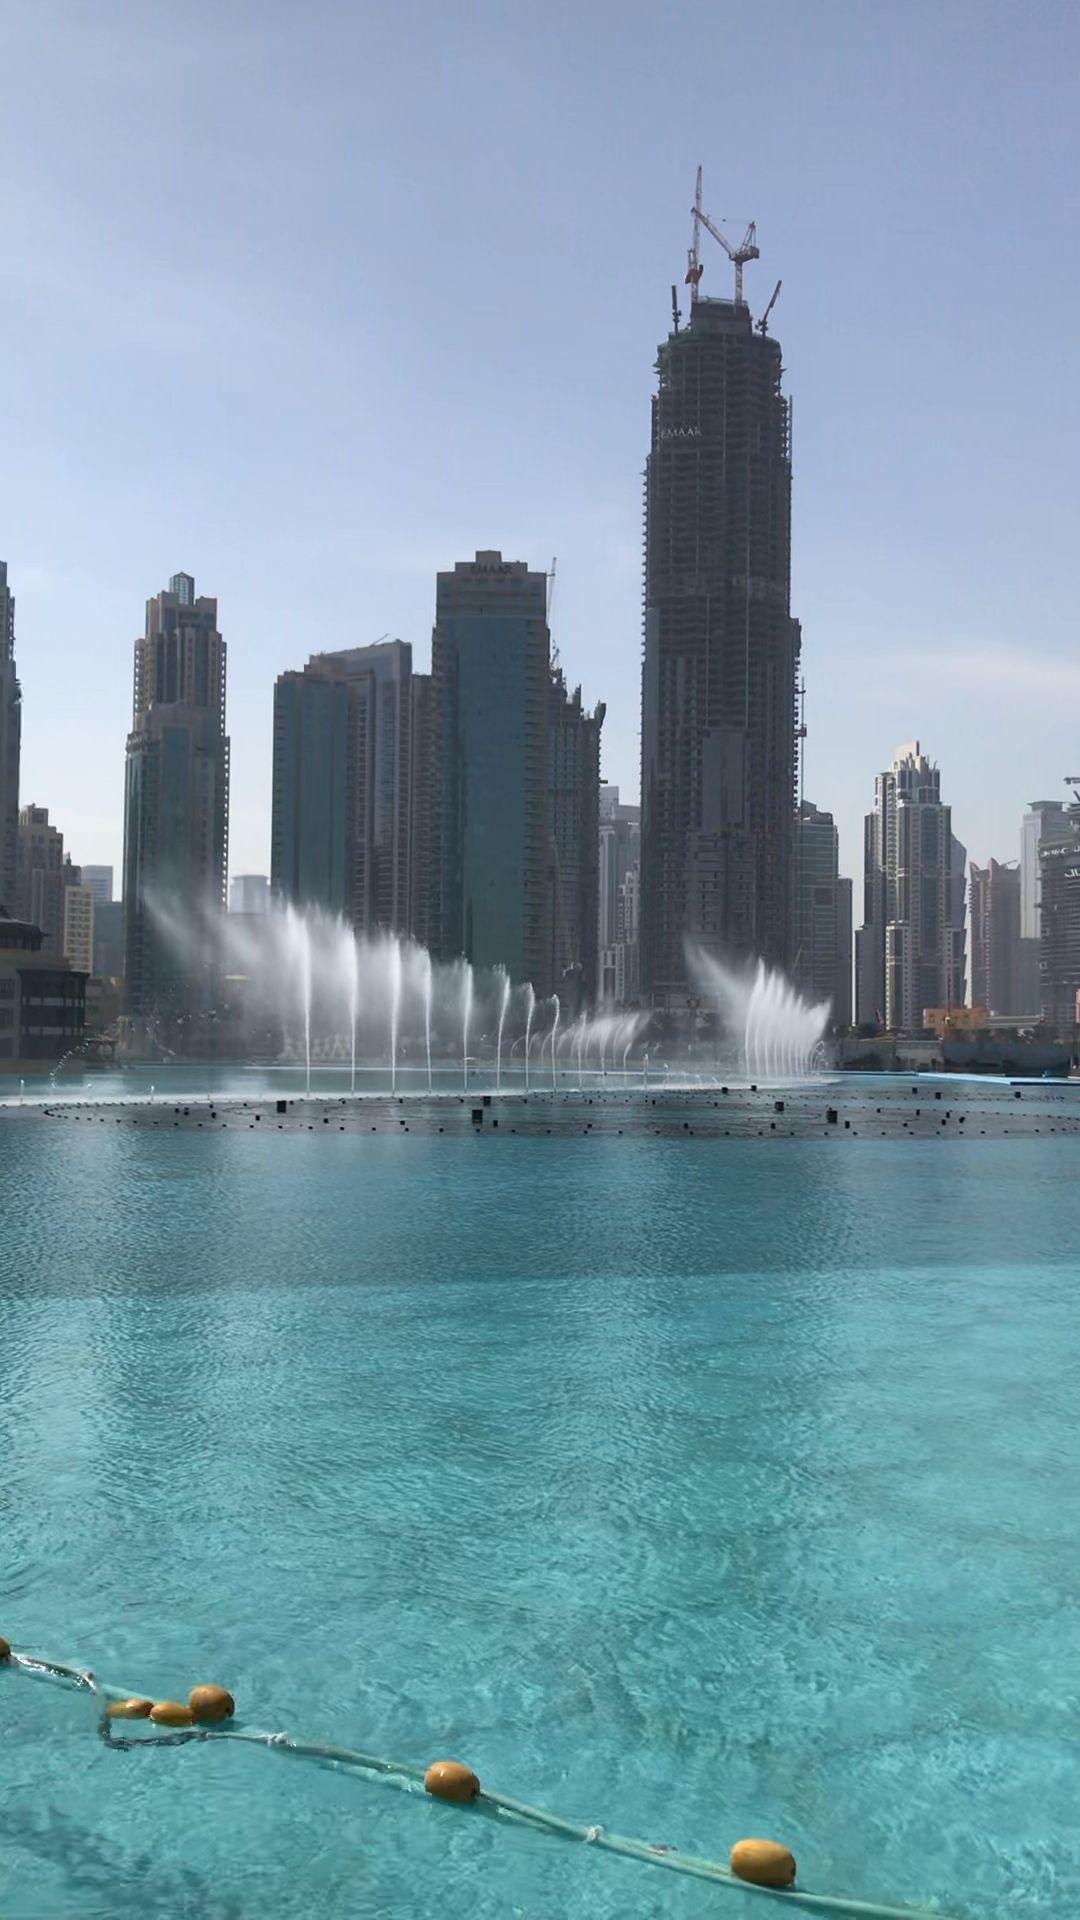 Best things to do in Dubai with toddlers, babies and kids including dubai mall fountains #dubai #dubaimall #visitdubai #visituae #familytravel